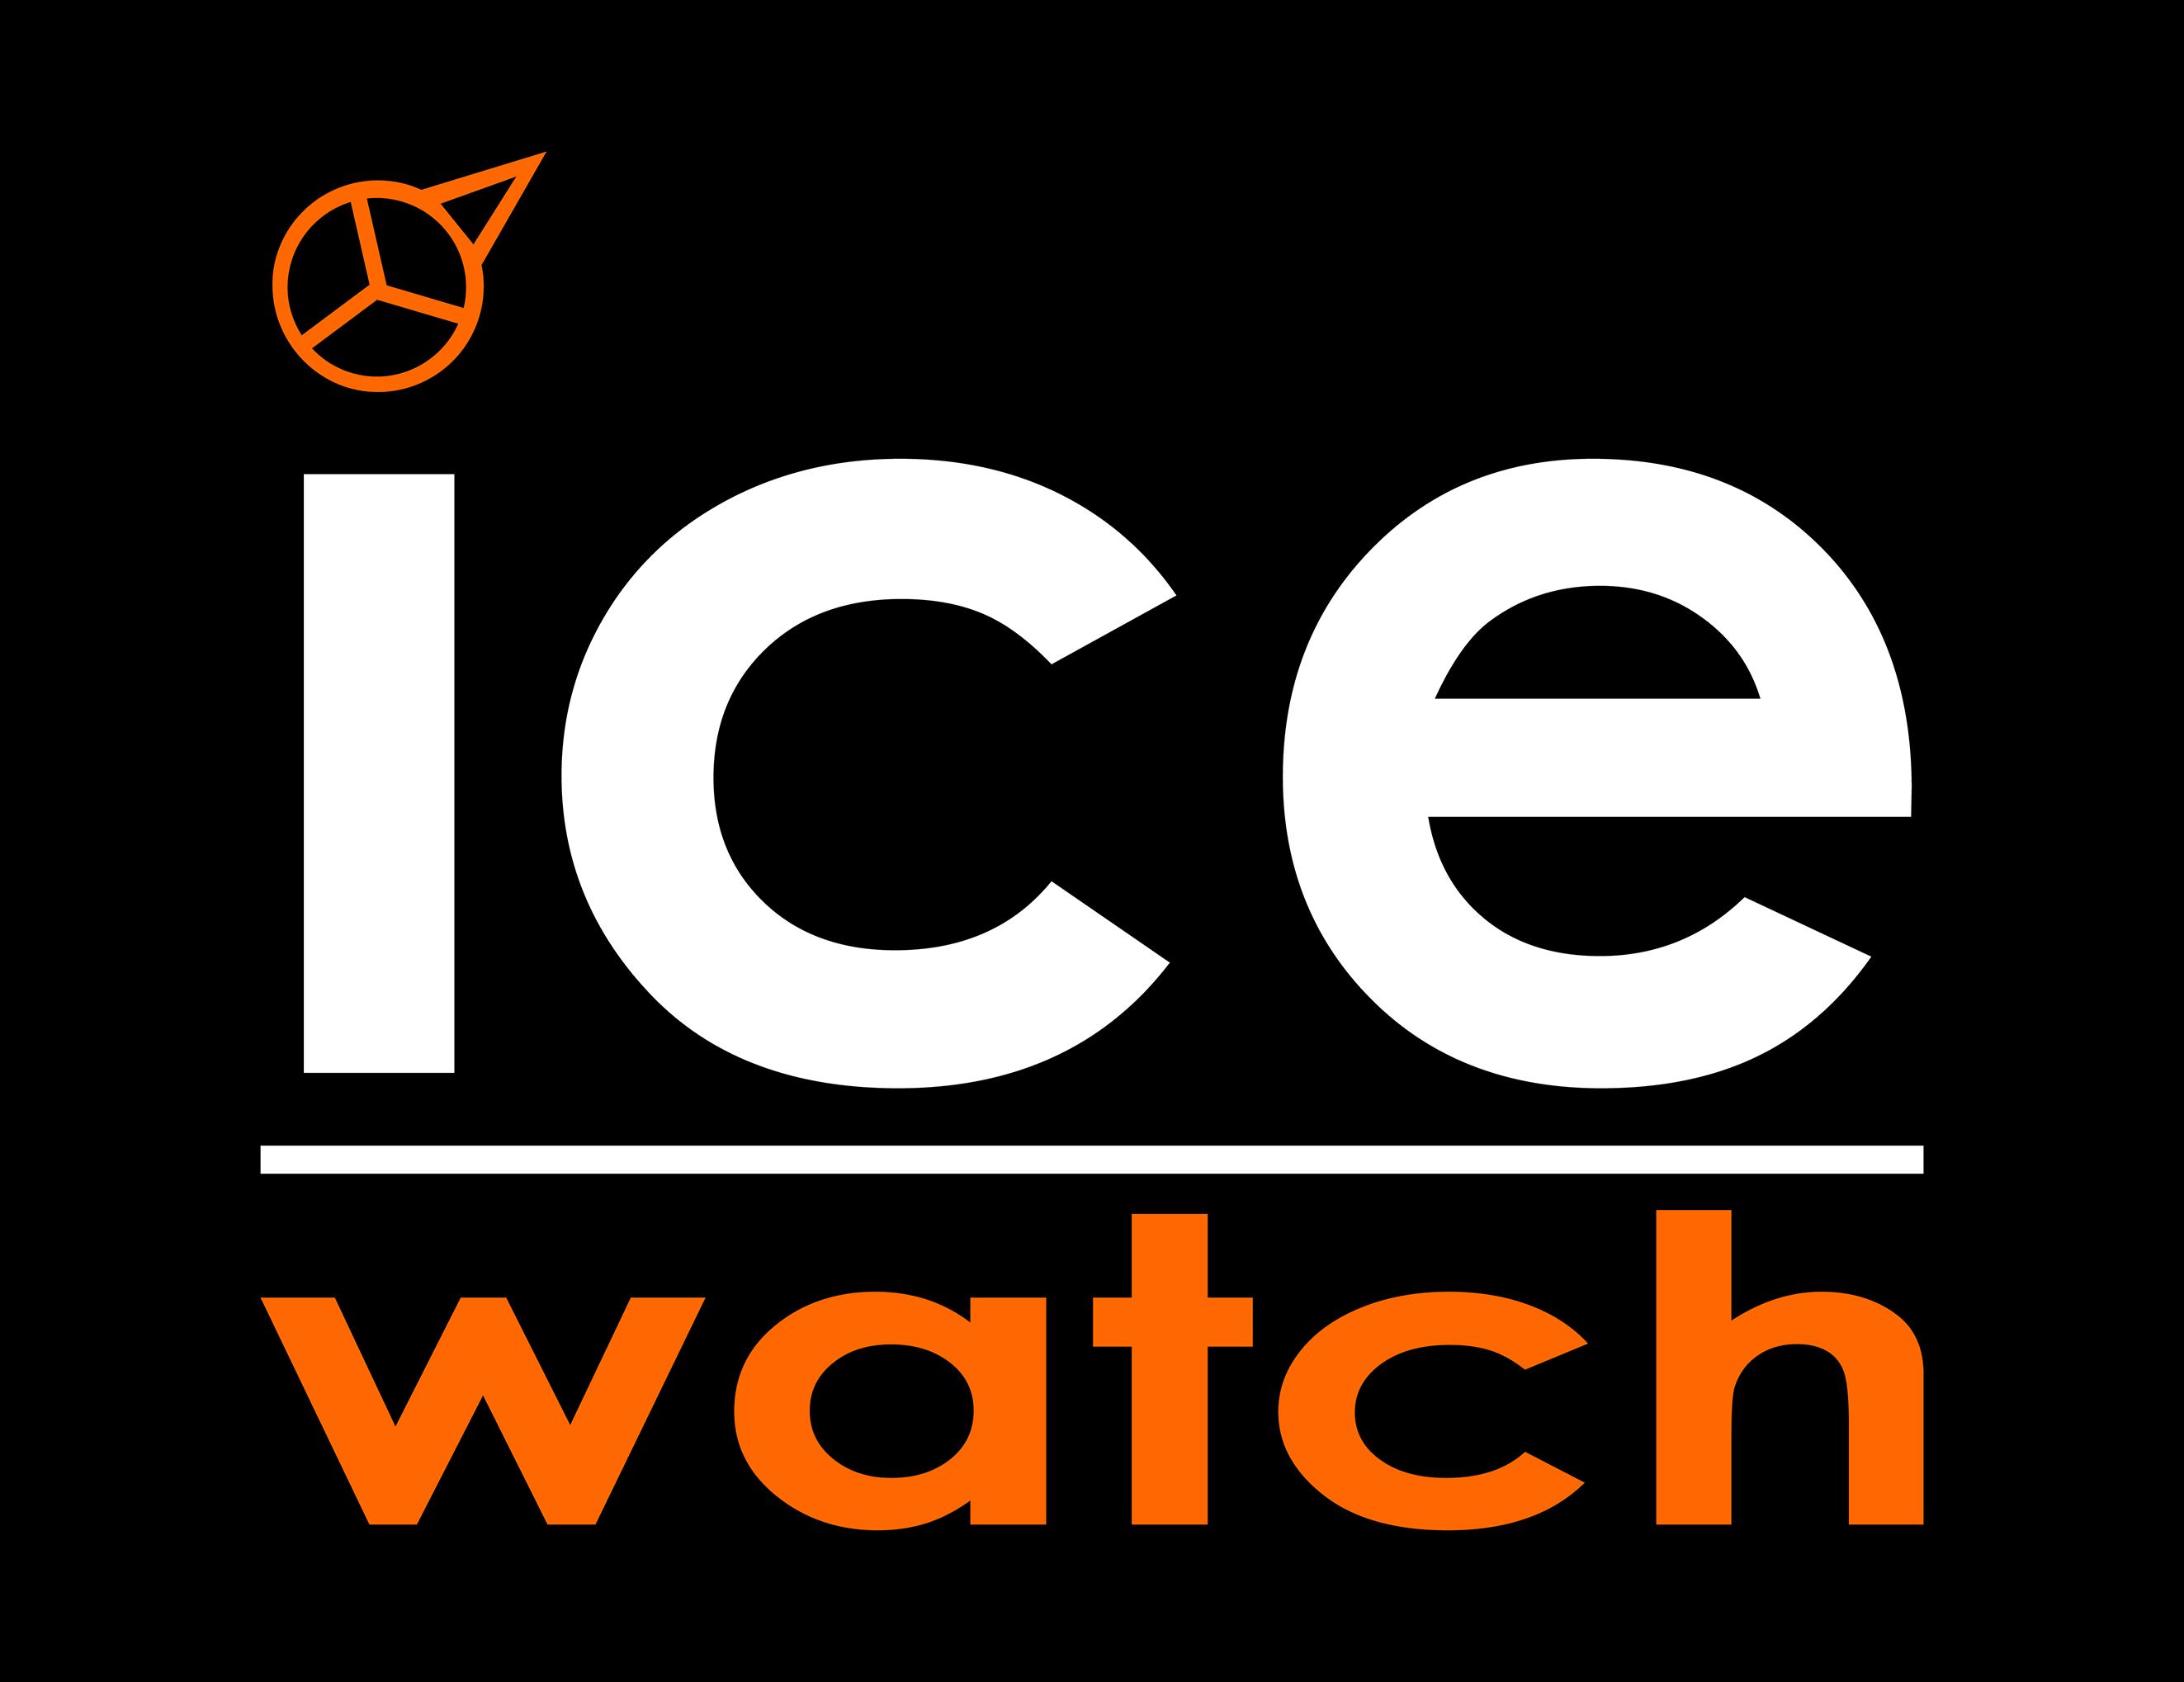 IW Logo White Orange BlackBG